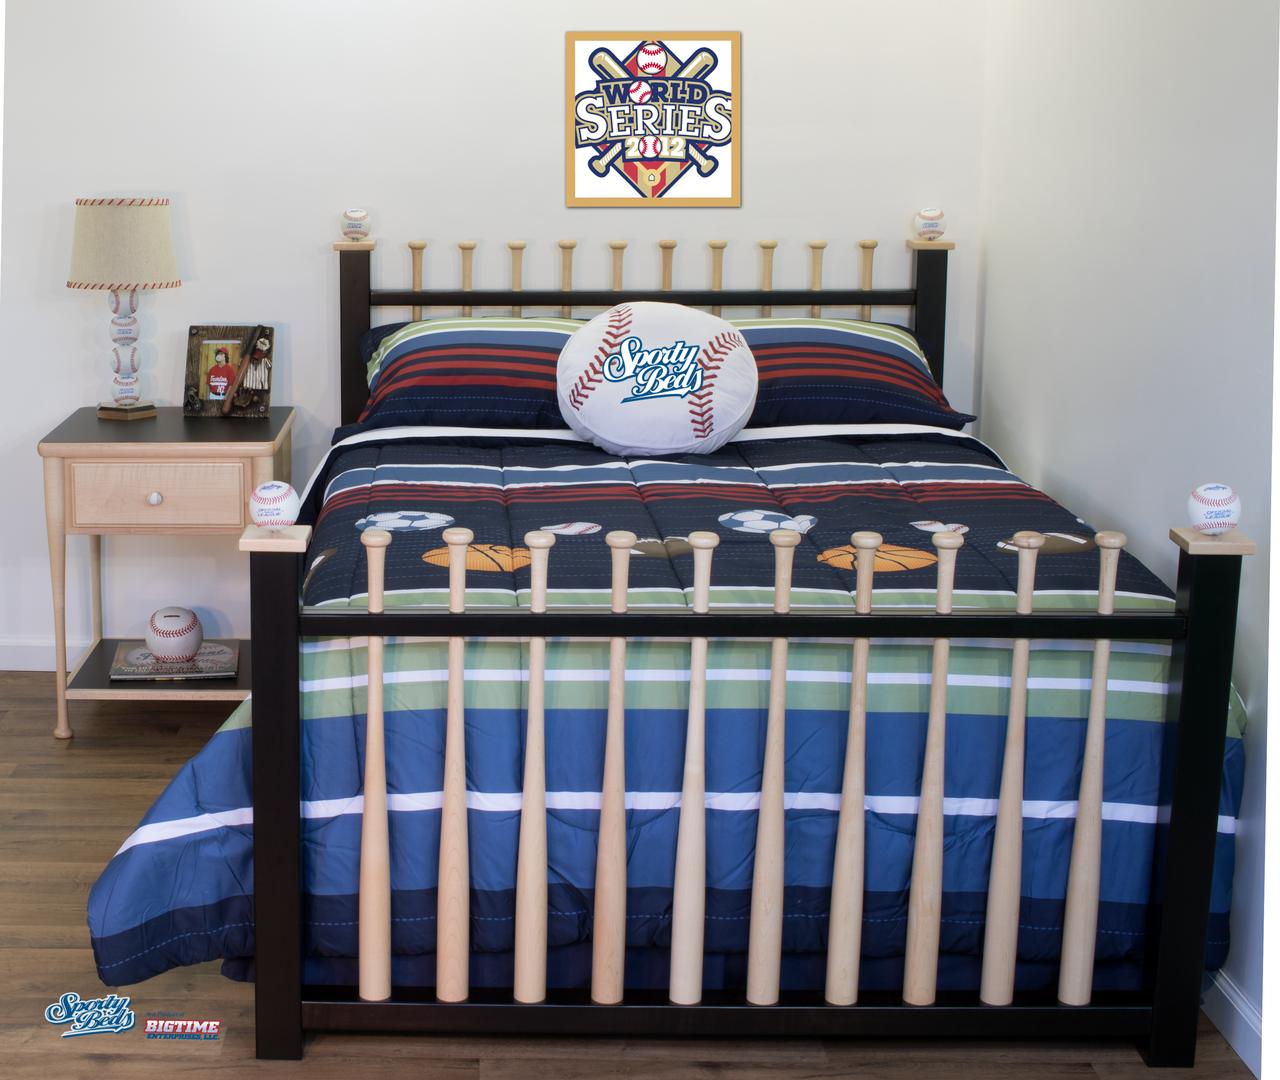 Grand Slam 3 Piece Bedroom Set / Sporty Beds